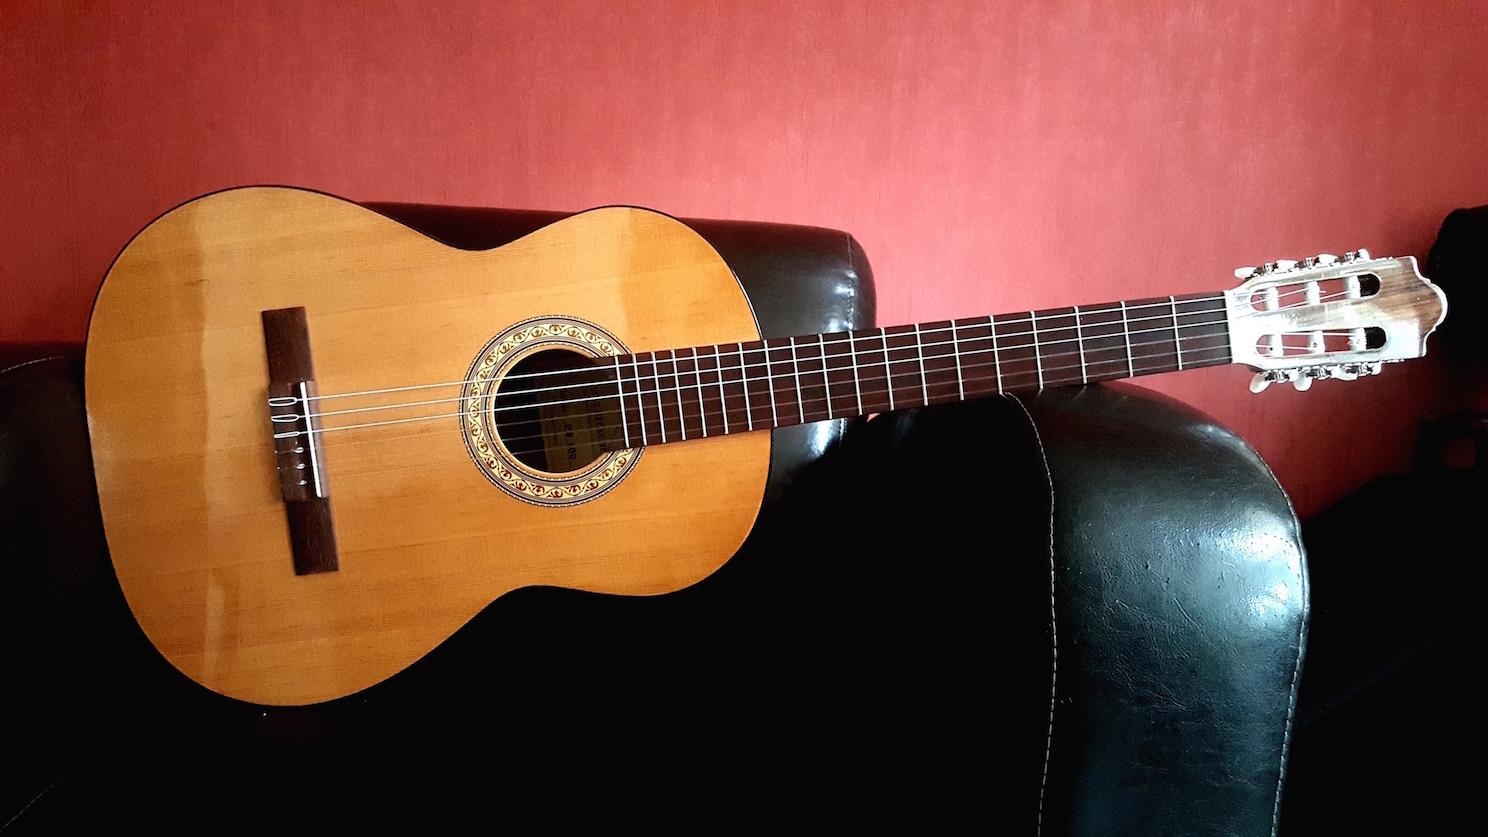 guitare classique paul beuscher pb 400